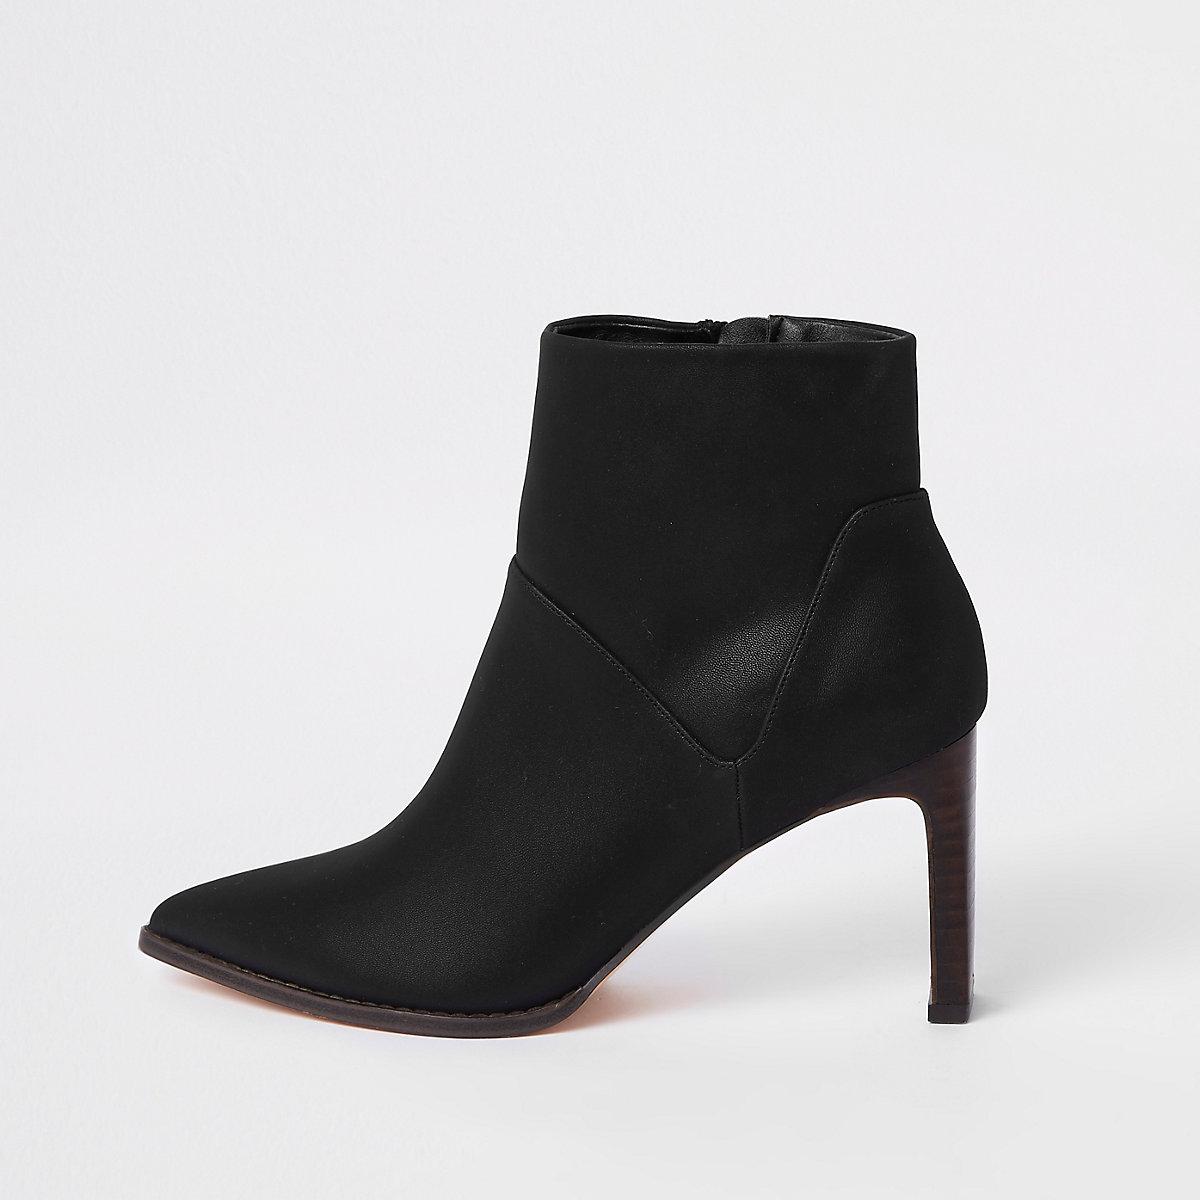 Black pointed slim square heel boots